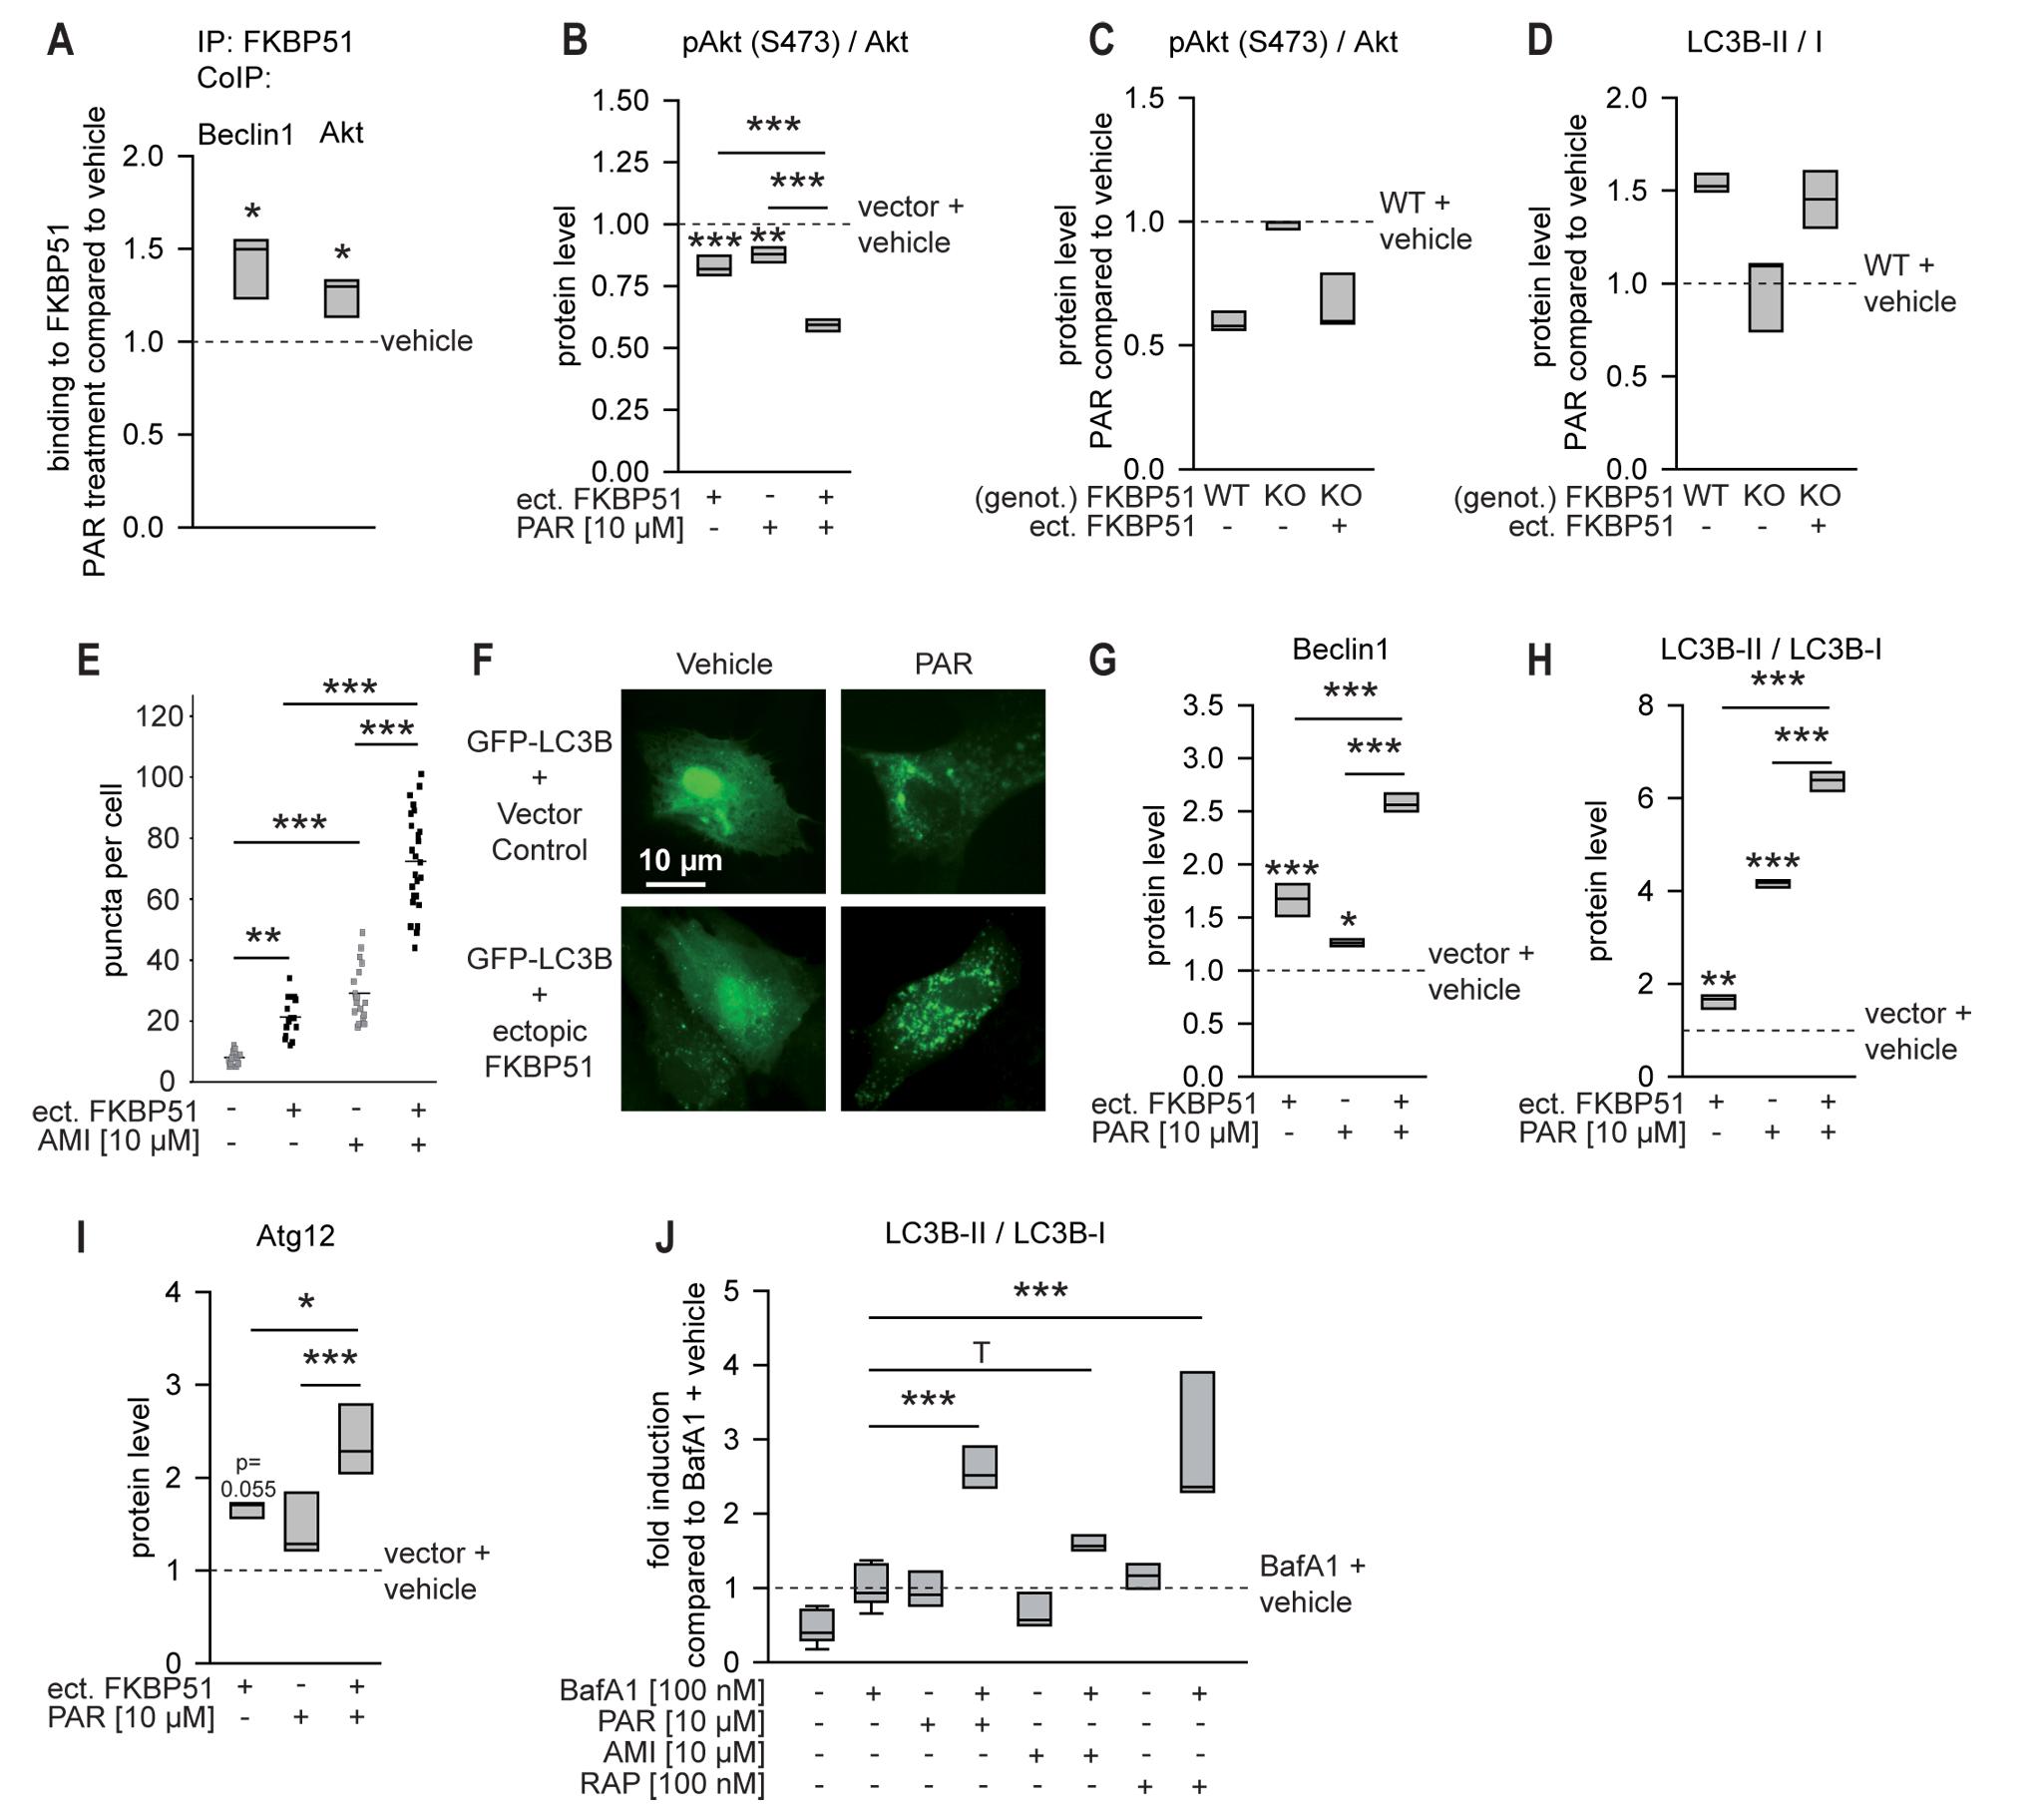 FKBP51 enhances cellular effects of antidepressants.